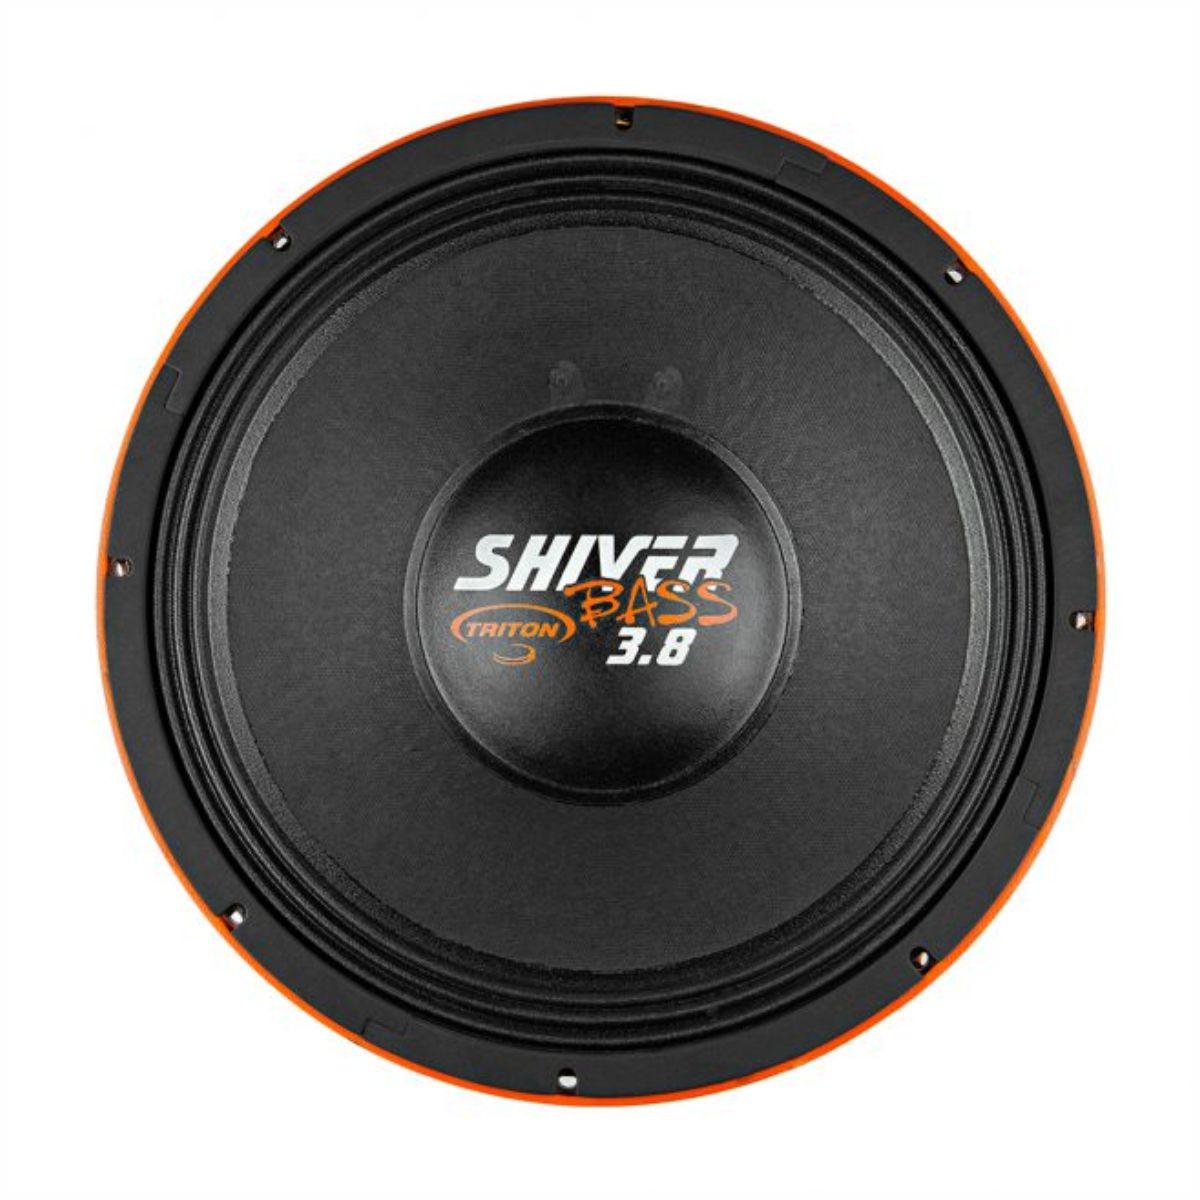 "Alto Falante Woofer Triton 15"" Shiver Bass 3.8 1900W Rms 4 Ohms"